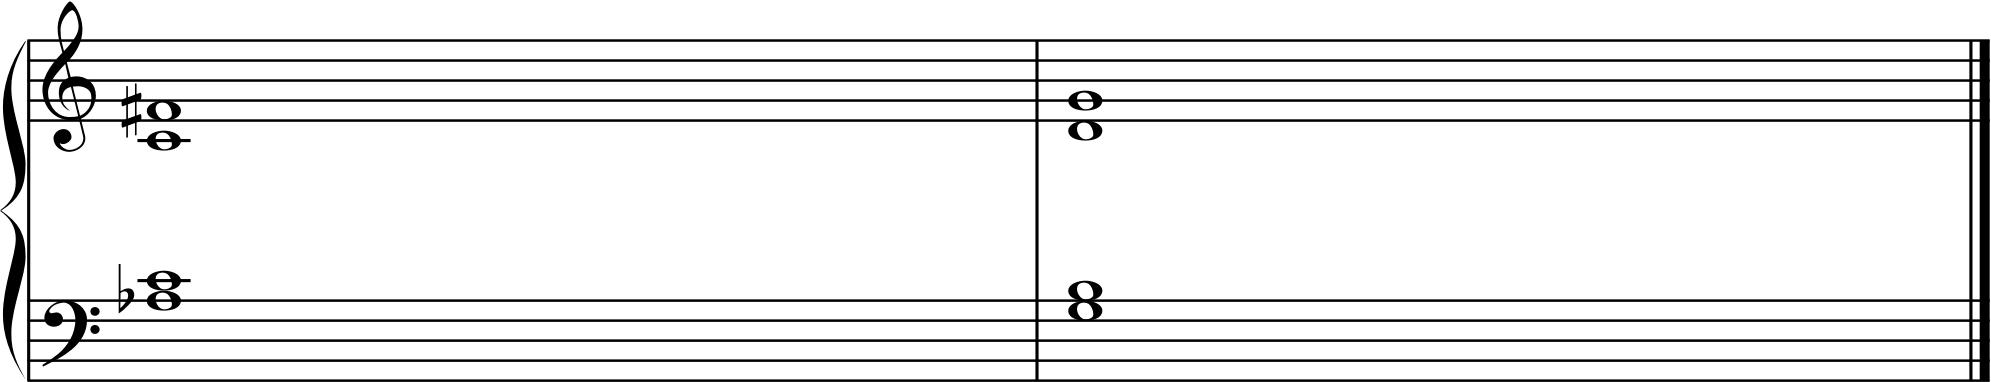 Italian +6 chord